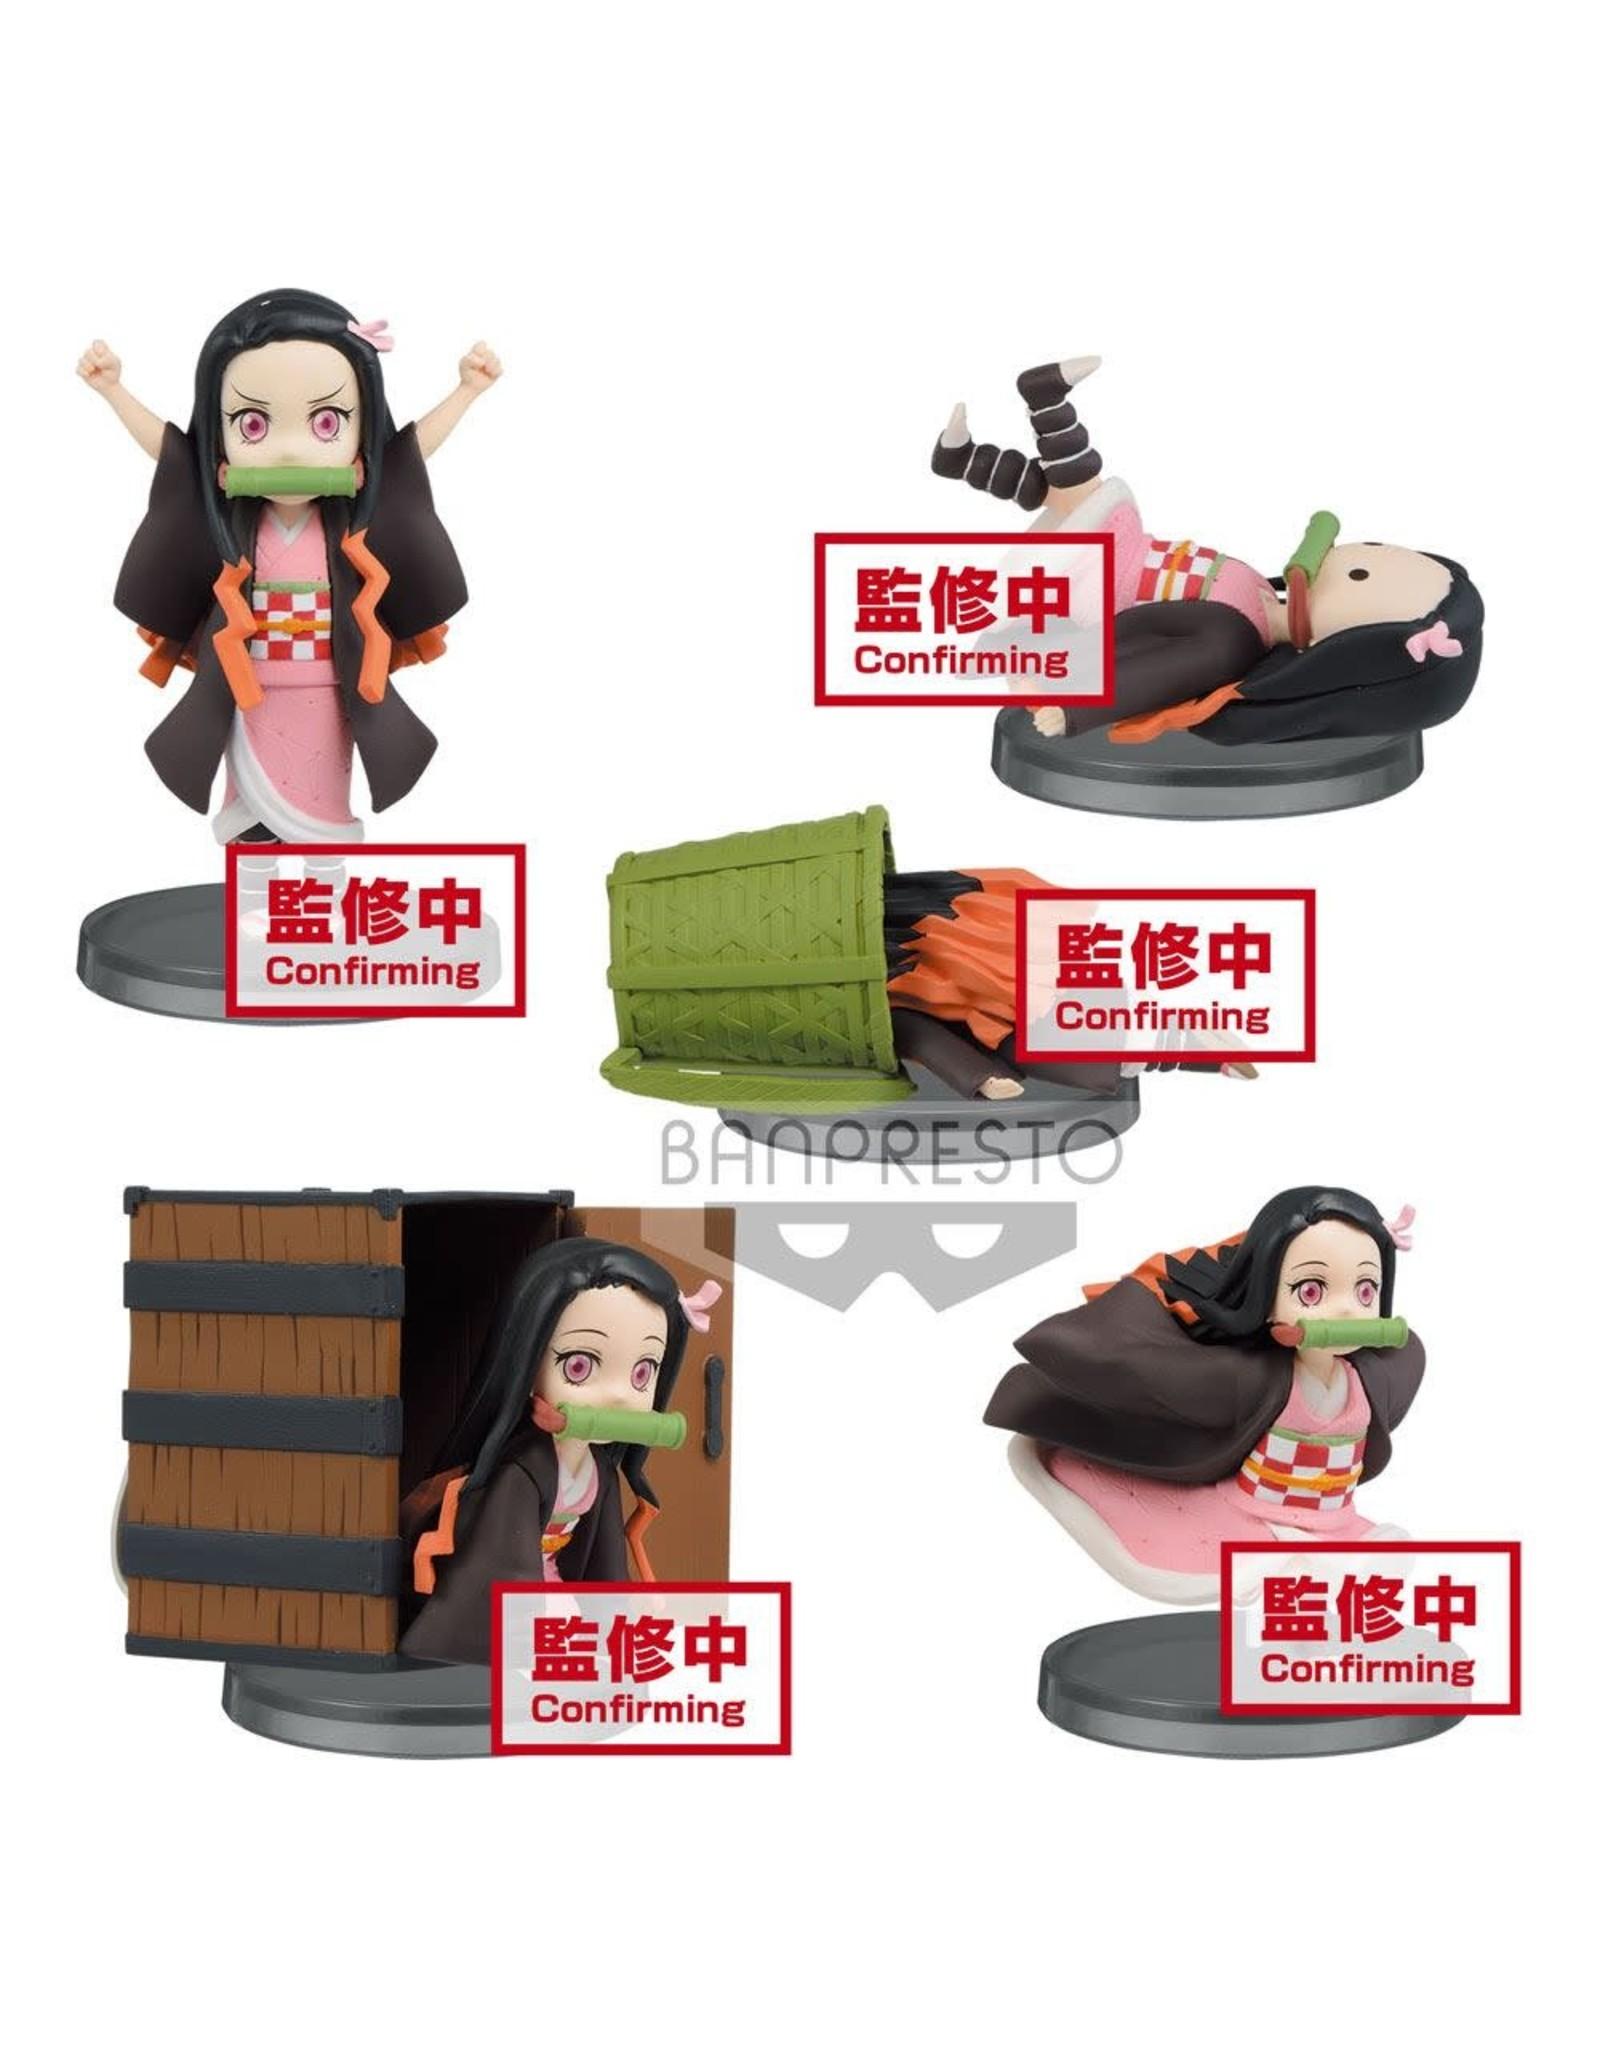 Demon Slayer: Kimetsu no Yaiba - Nezuko Kamado - WCF ChiBi PVC Statues - 7 cm - 1 random item